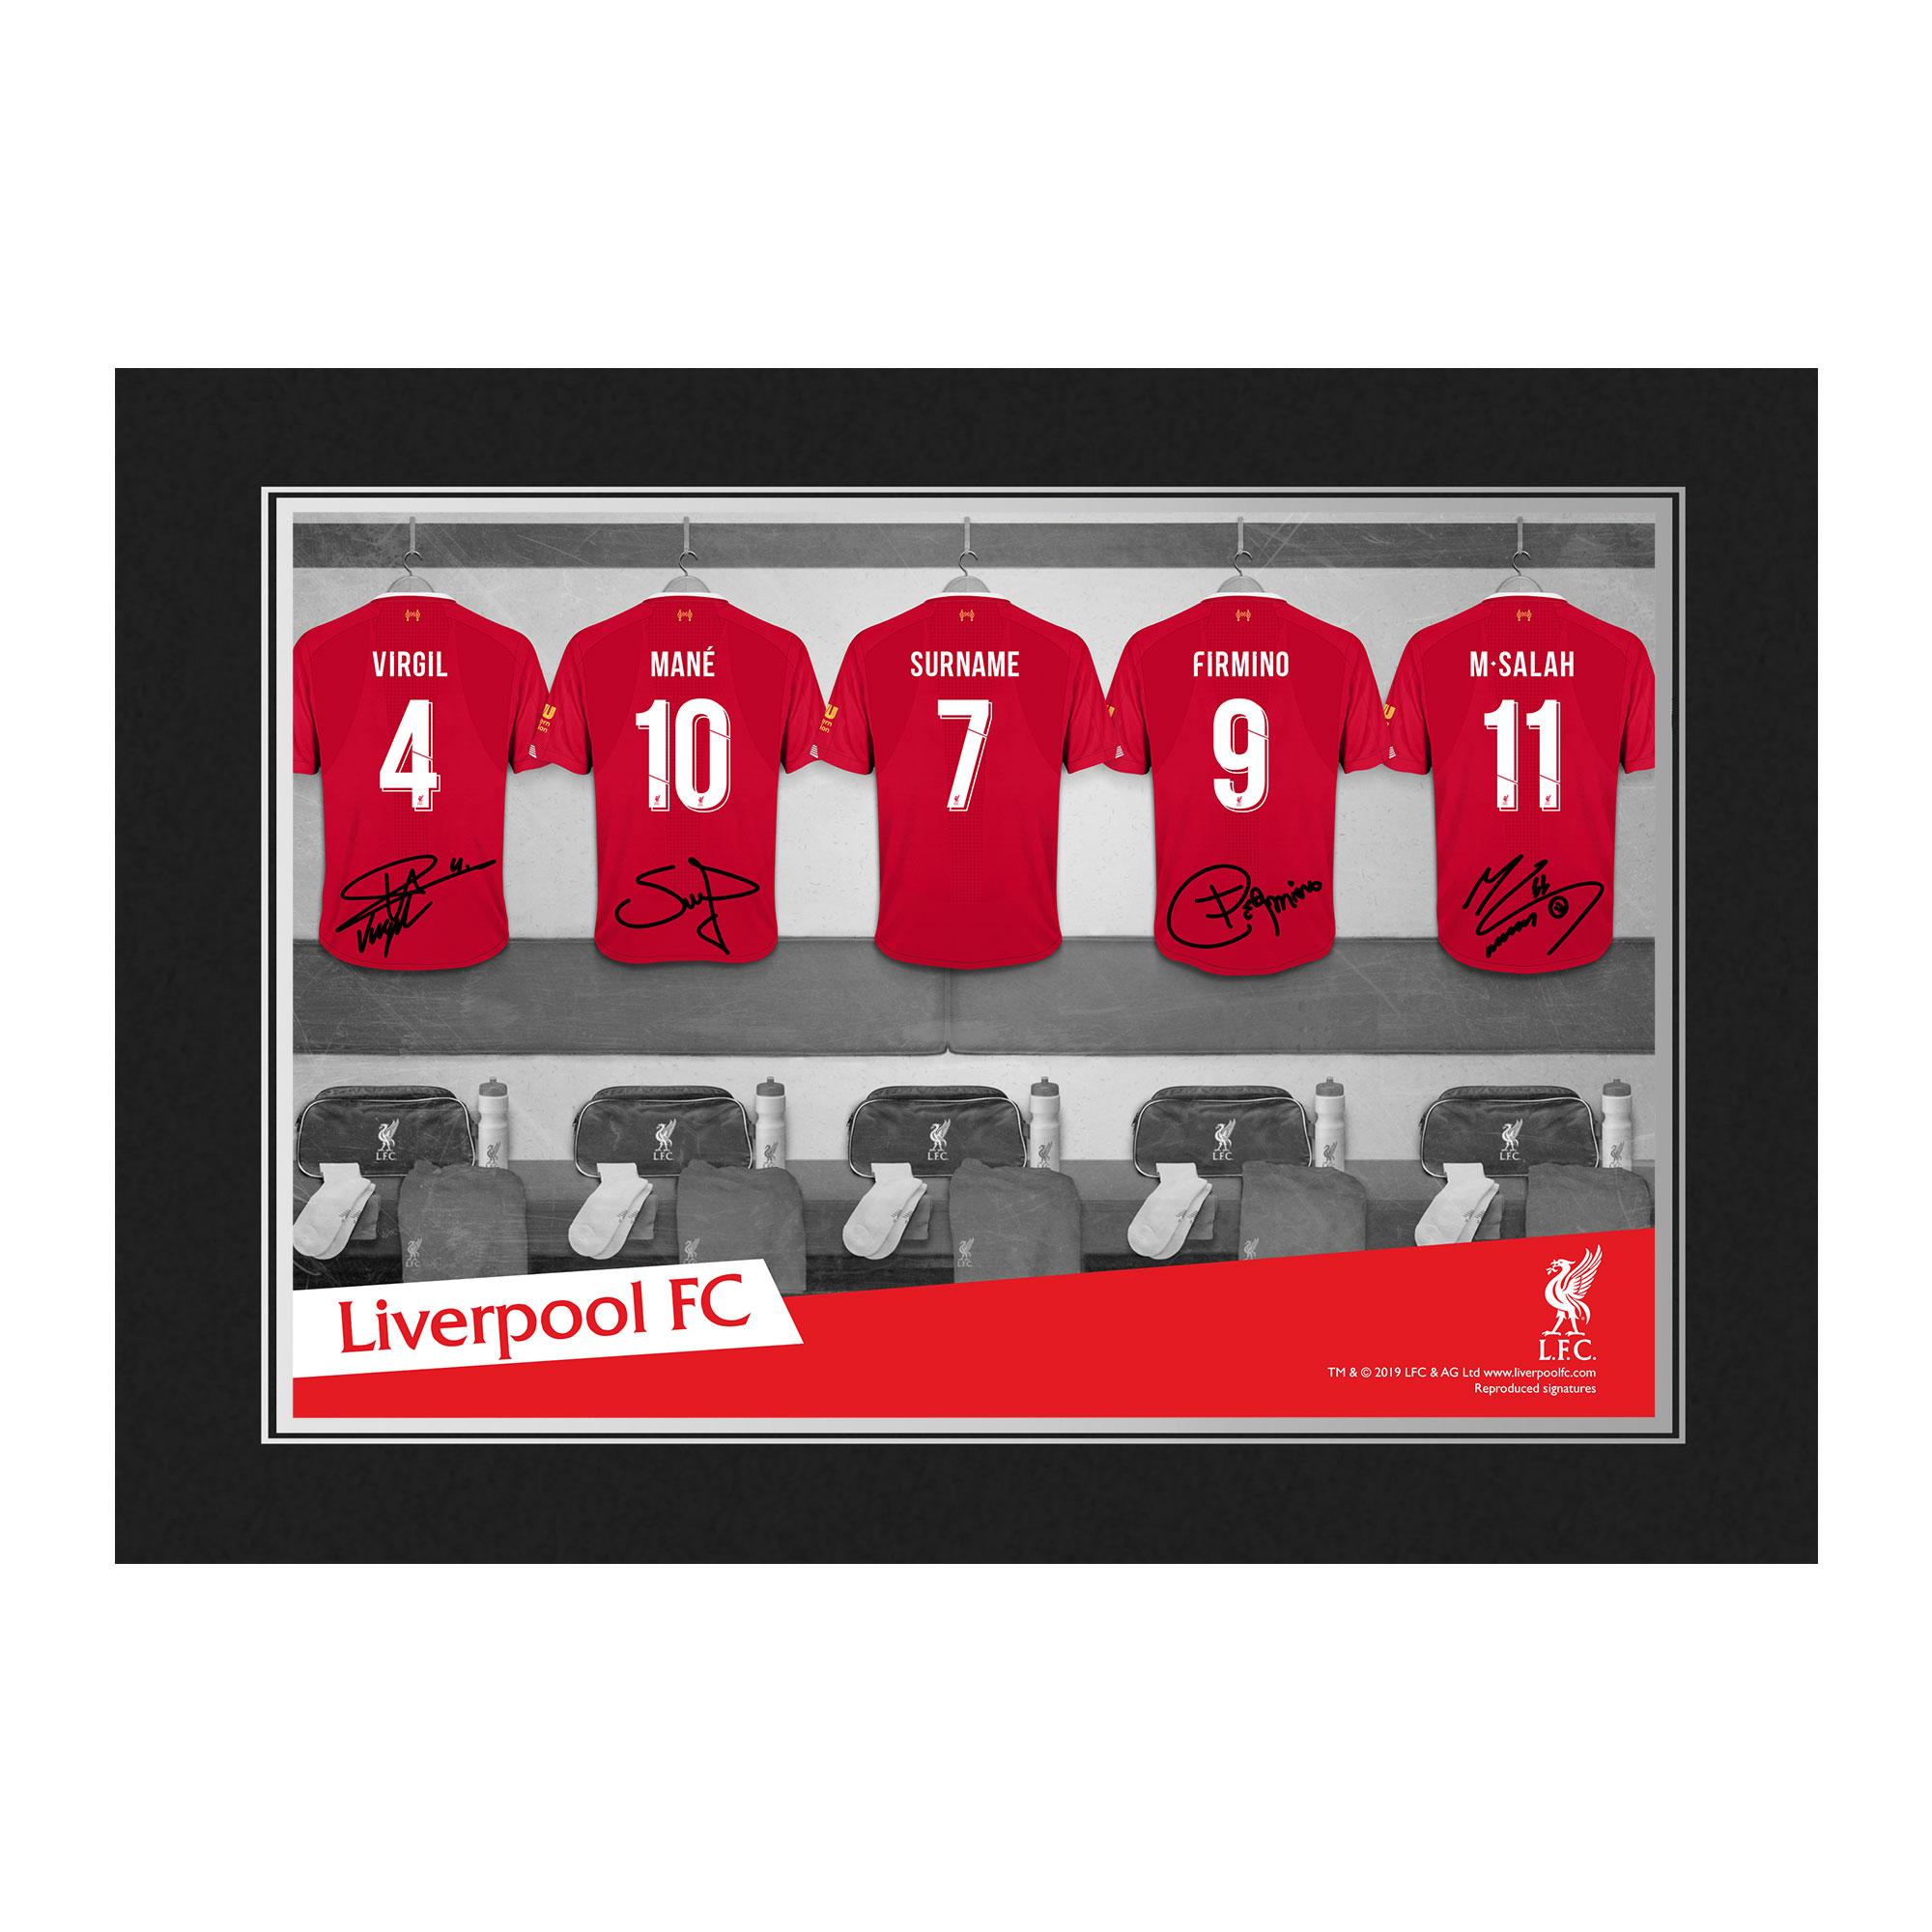 Liverpool FC 9x6 Dressing Room Photo Folder